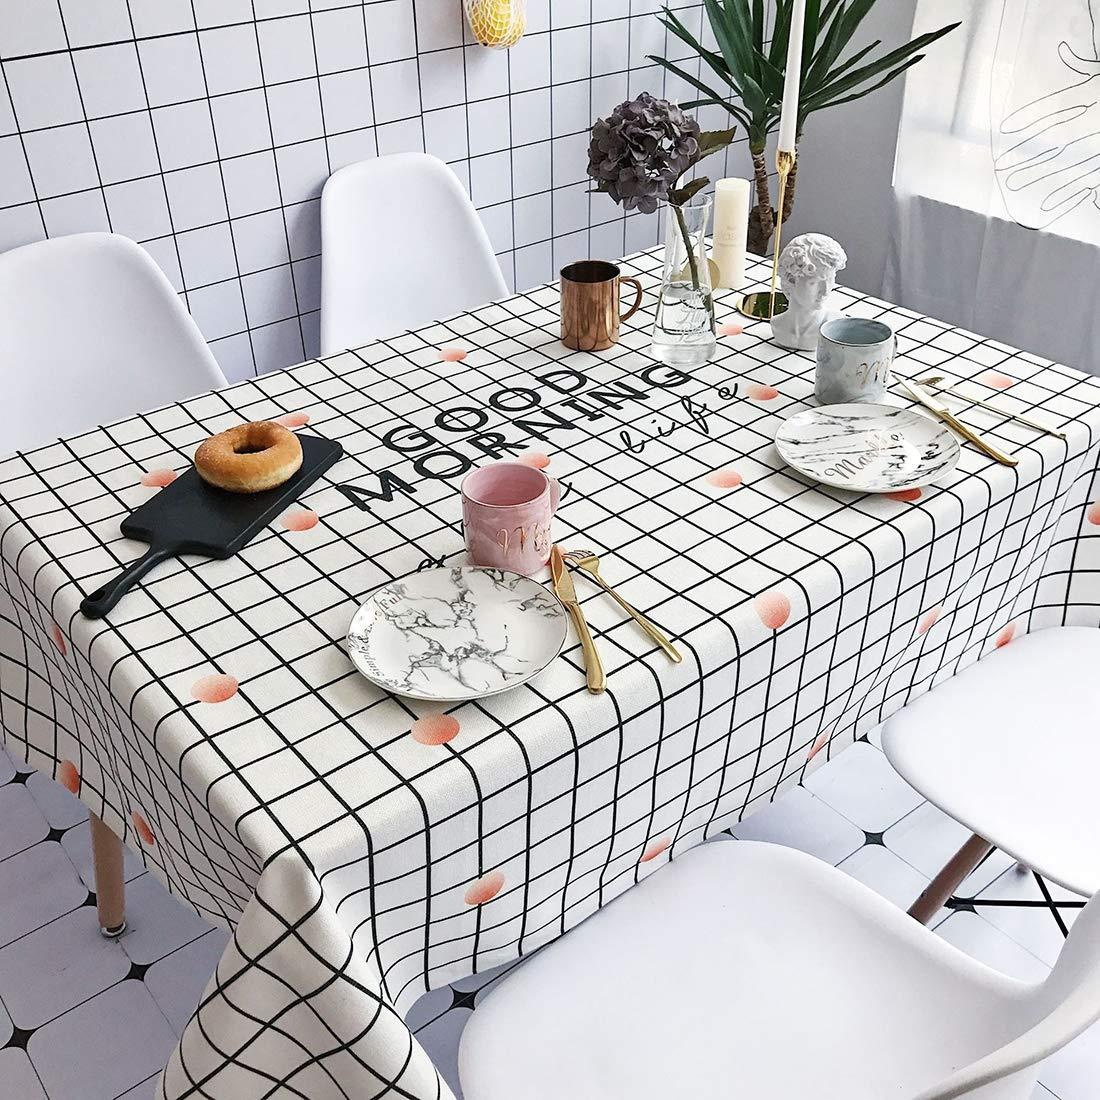 Anstorematealliance Home Textile ホームテキスタイルおはようございますパターン防水アンチスカーディング長方形コットンとリネンテーブルクロス、サイズ:200 x 140 cm   B07RZMQ4YM